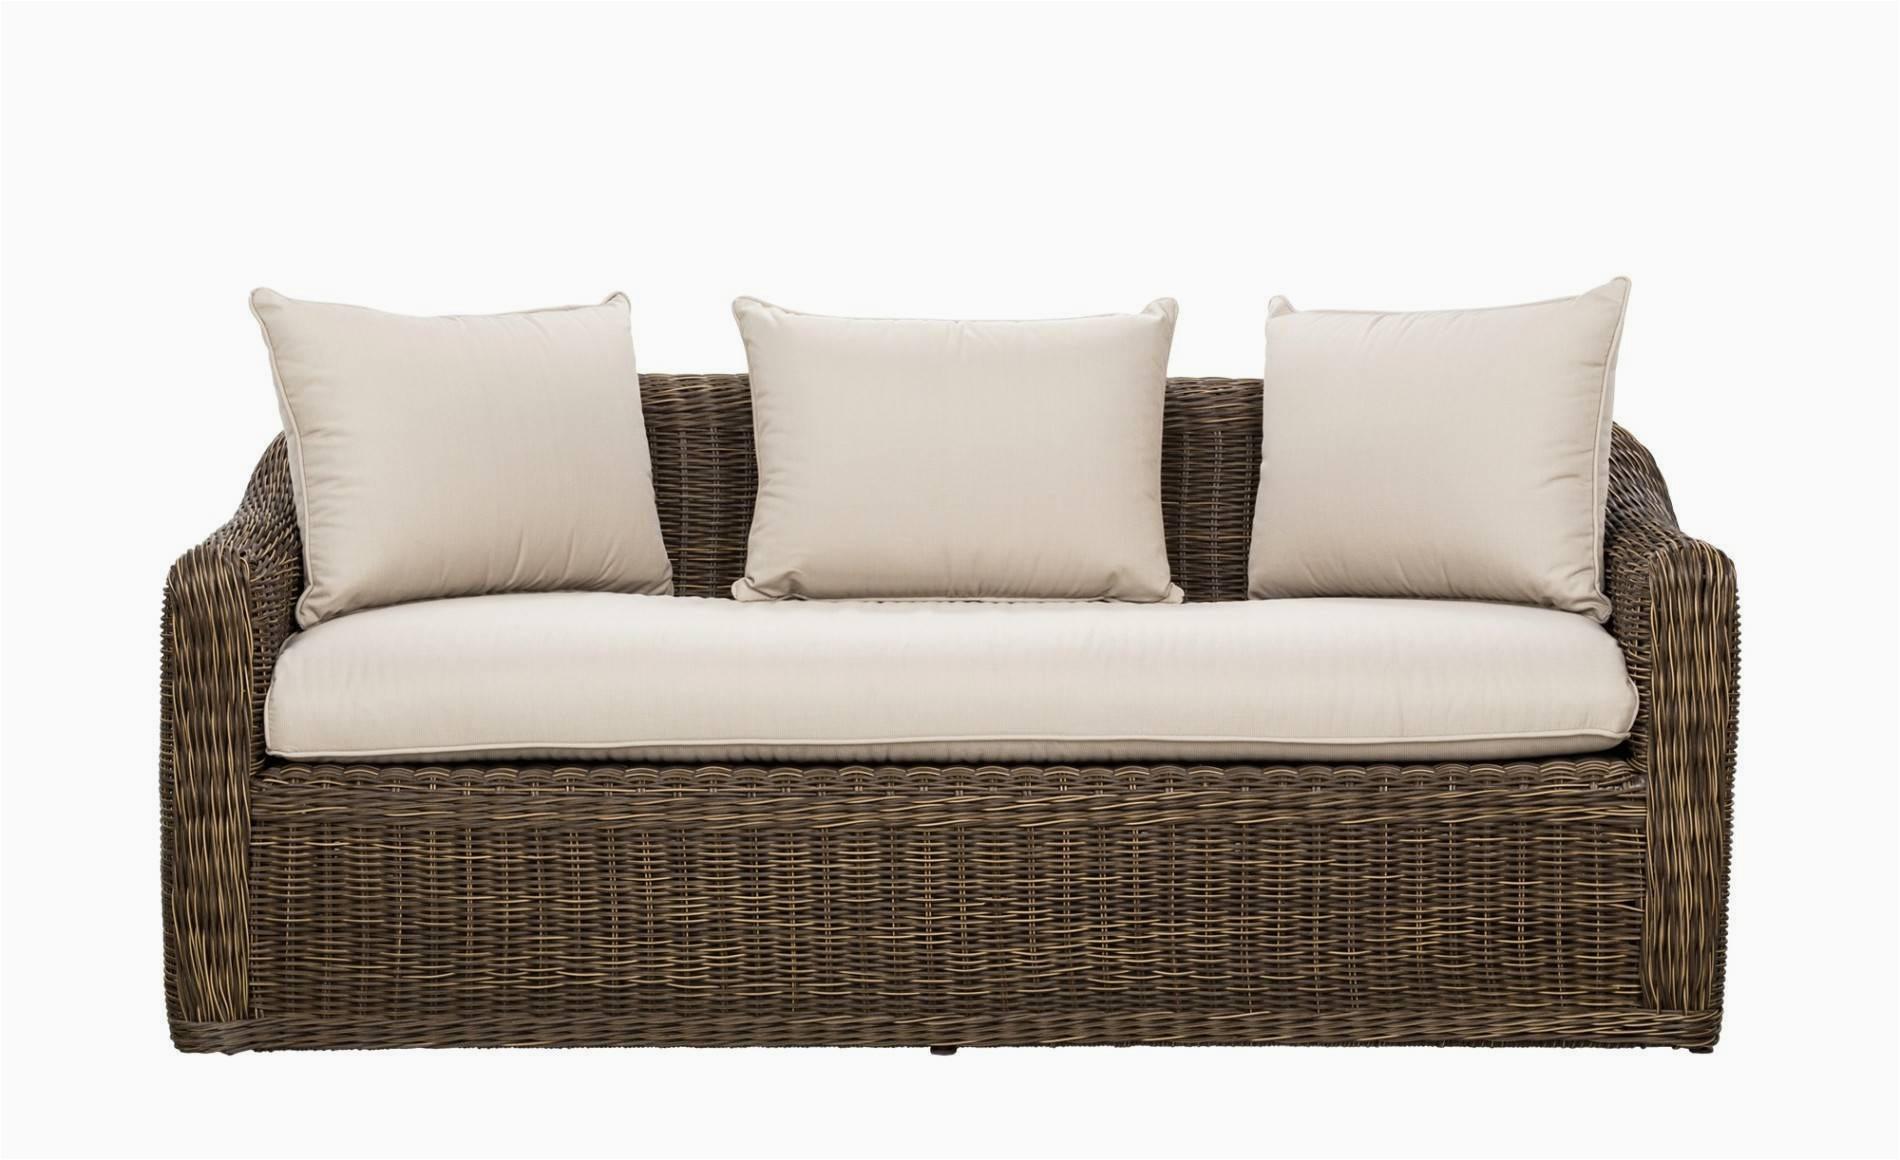 wicker outdoor furniture sale new patio sofa awesome luxuria¶s wicker outdoor sofa 0d patio chairs sale